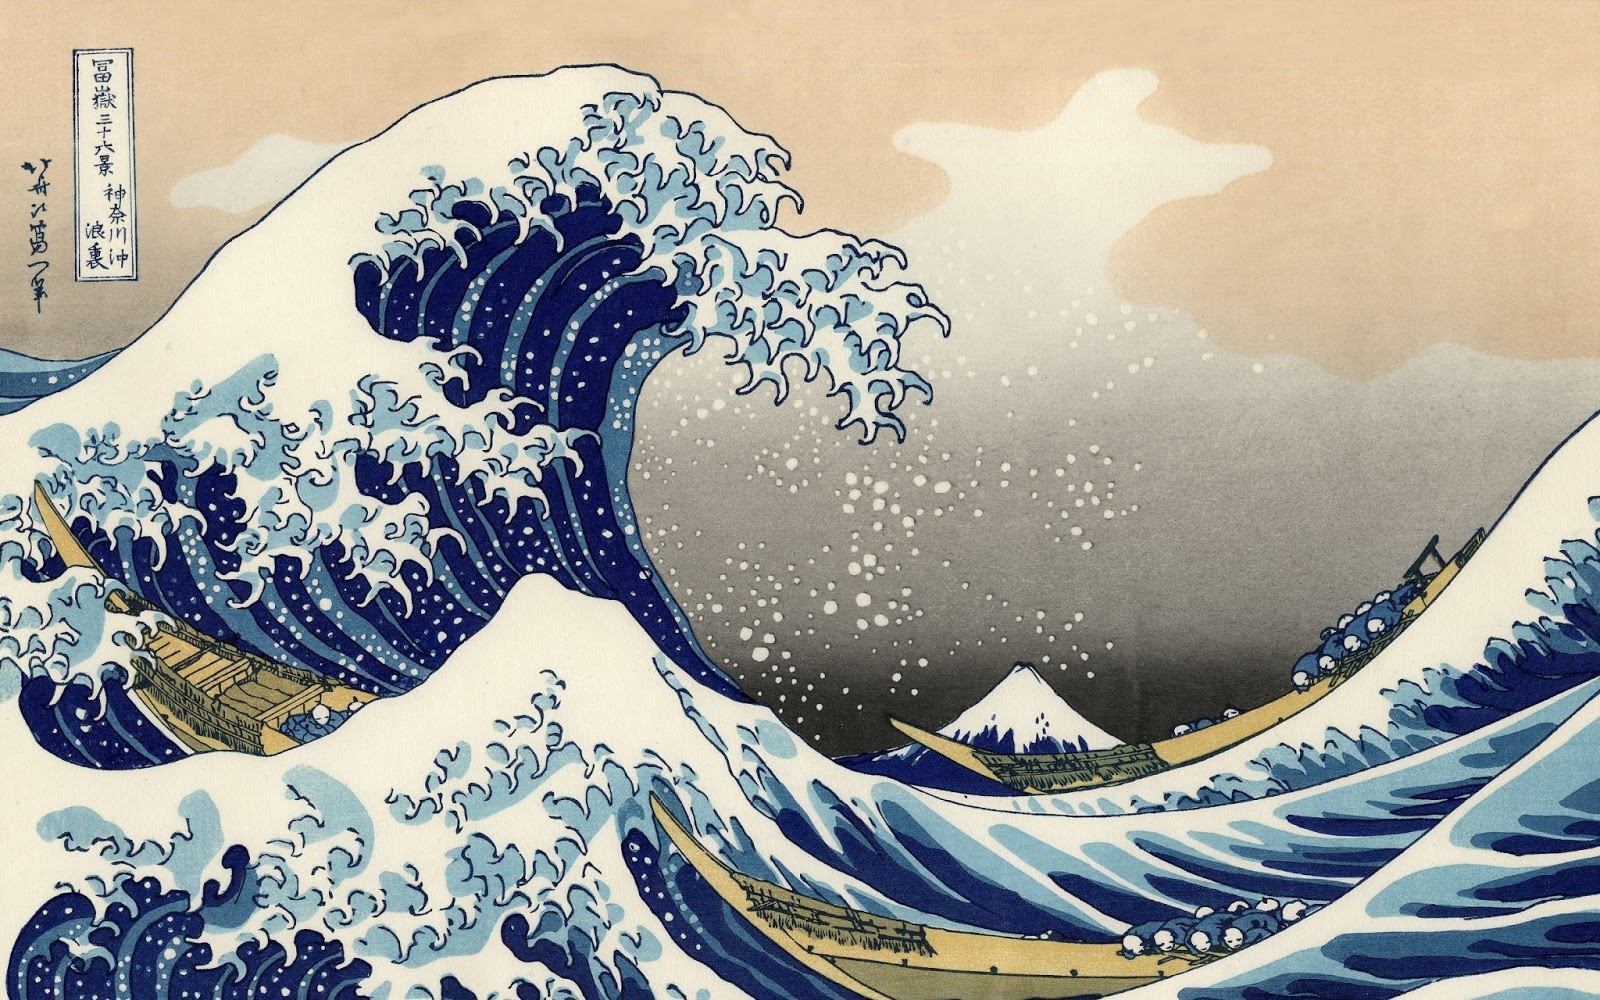 Hokusai by Night: Visita Guidata Serale alla Mostra